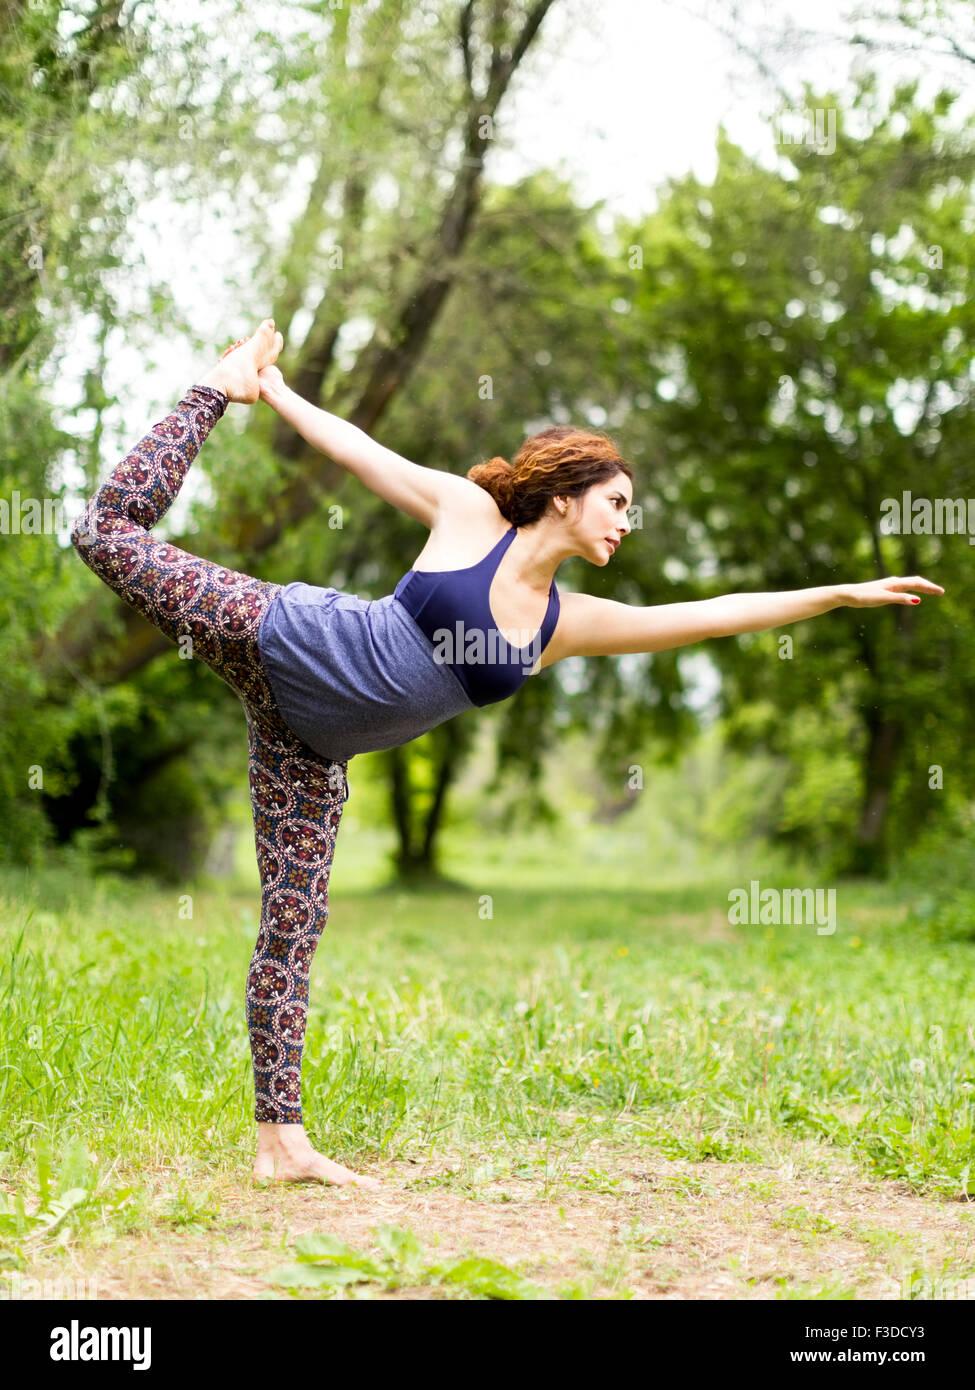 Frau, die Bewegung in der Natur Stockbild